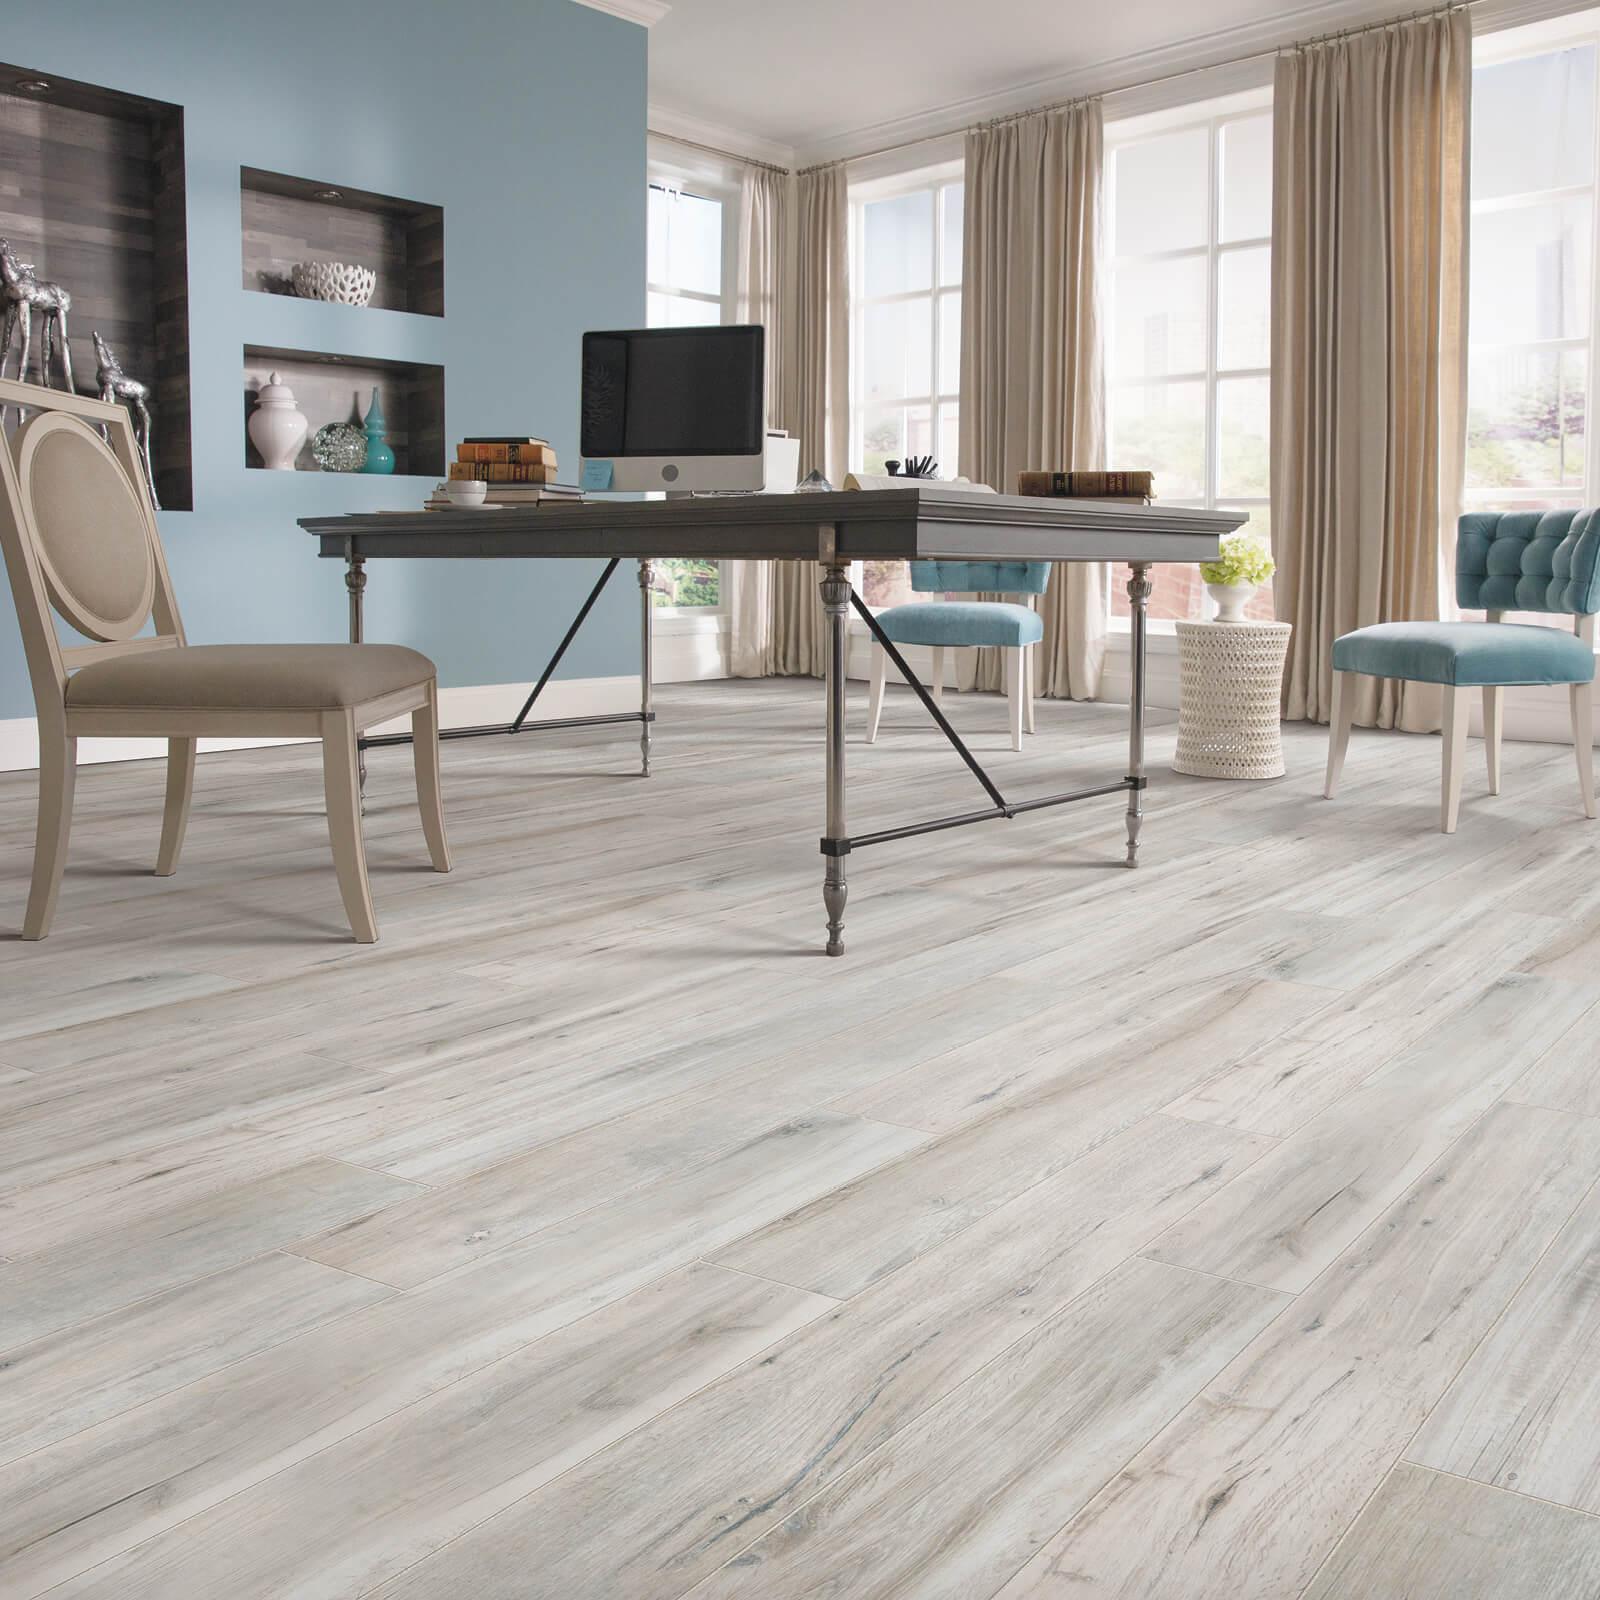 Magnolia Bend Chesapeake Grey flooring | Dolphin Carpet & Tile